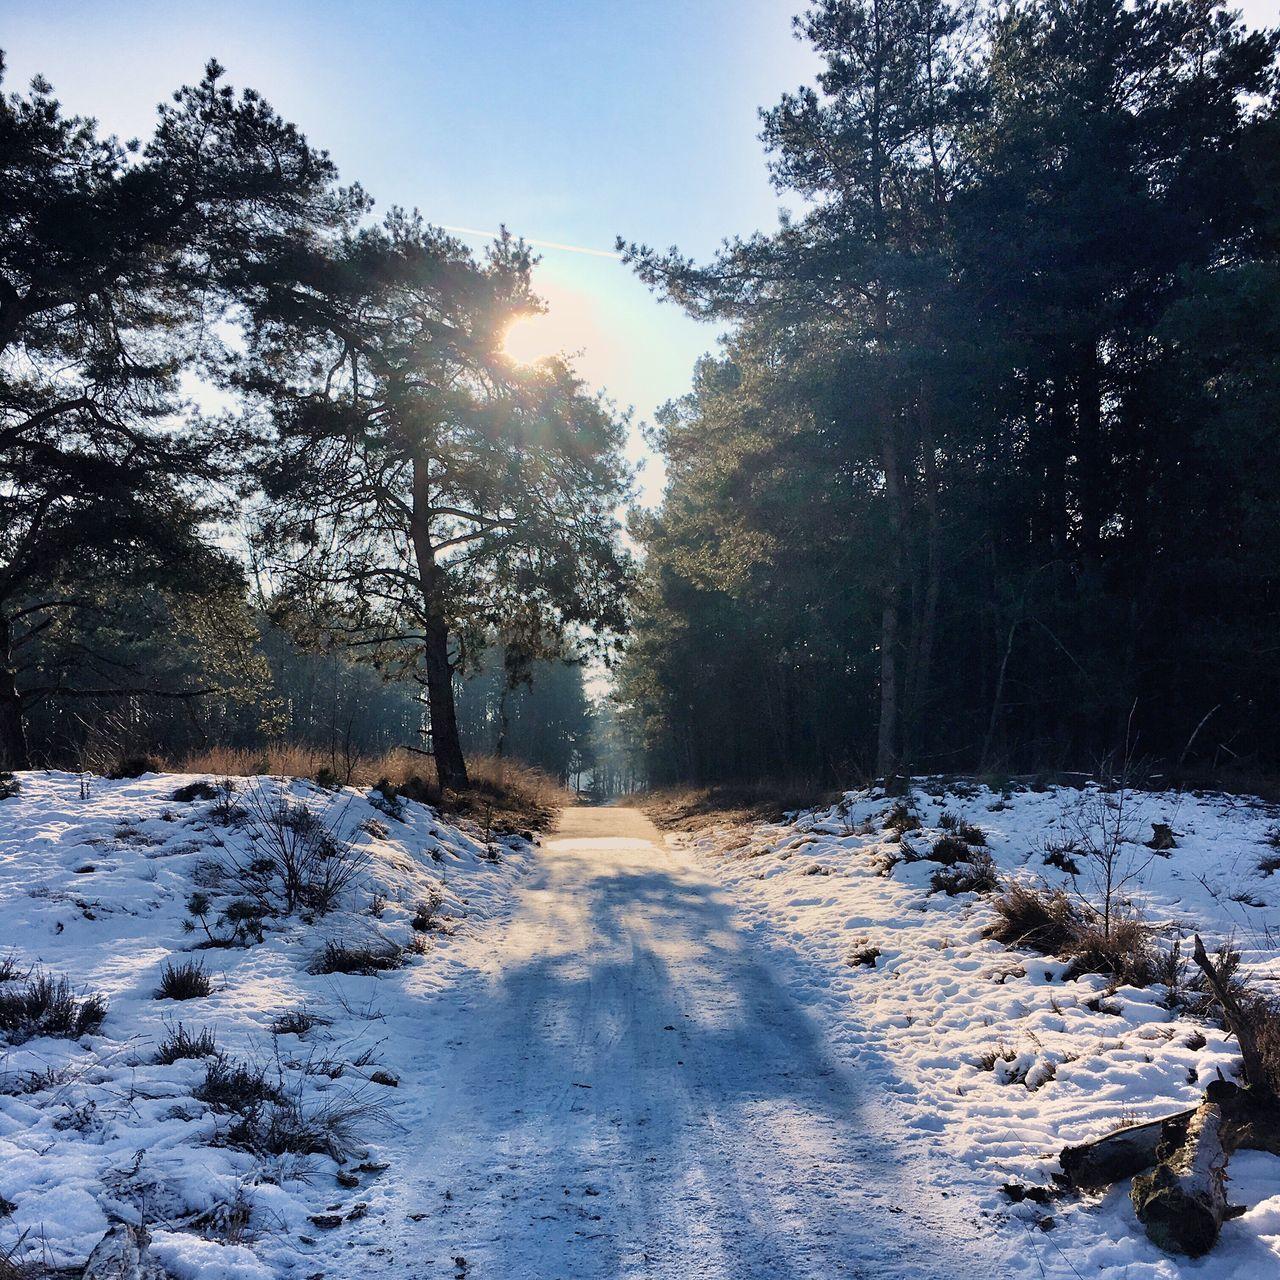 Sunny Winter Day Winter Walk Winter Wonderland Sun And Snow